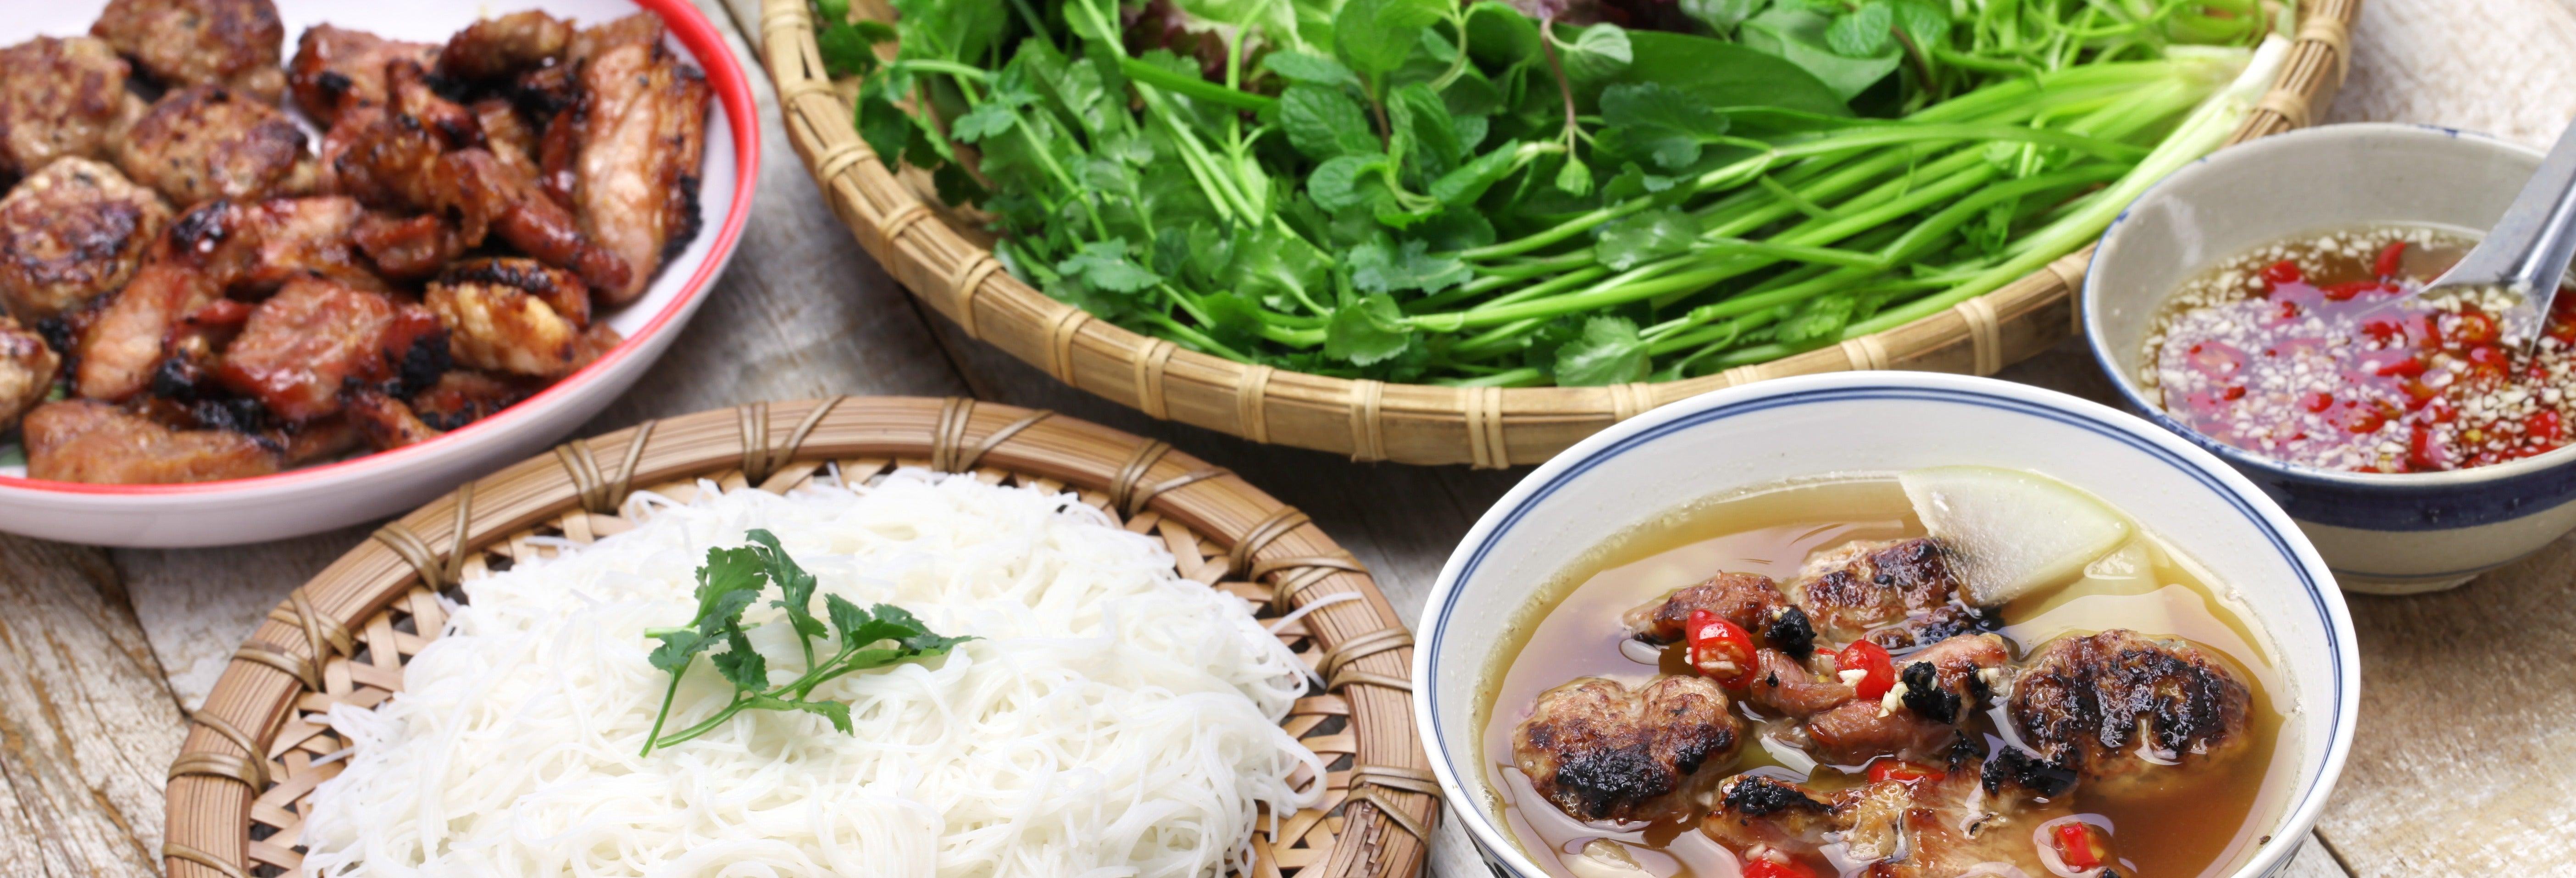 Tour gastronómico por Hanói